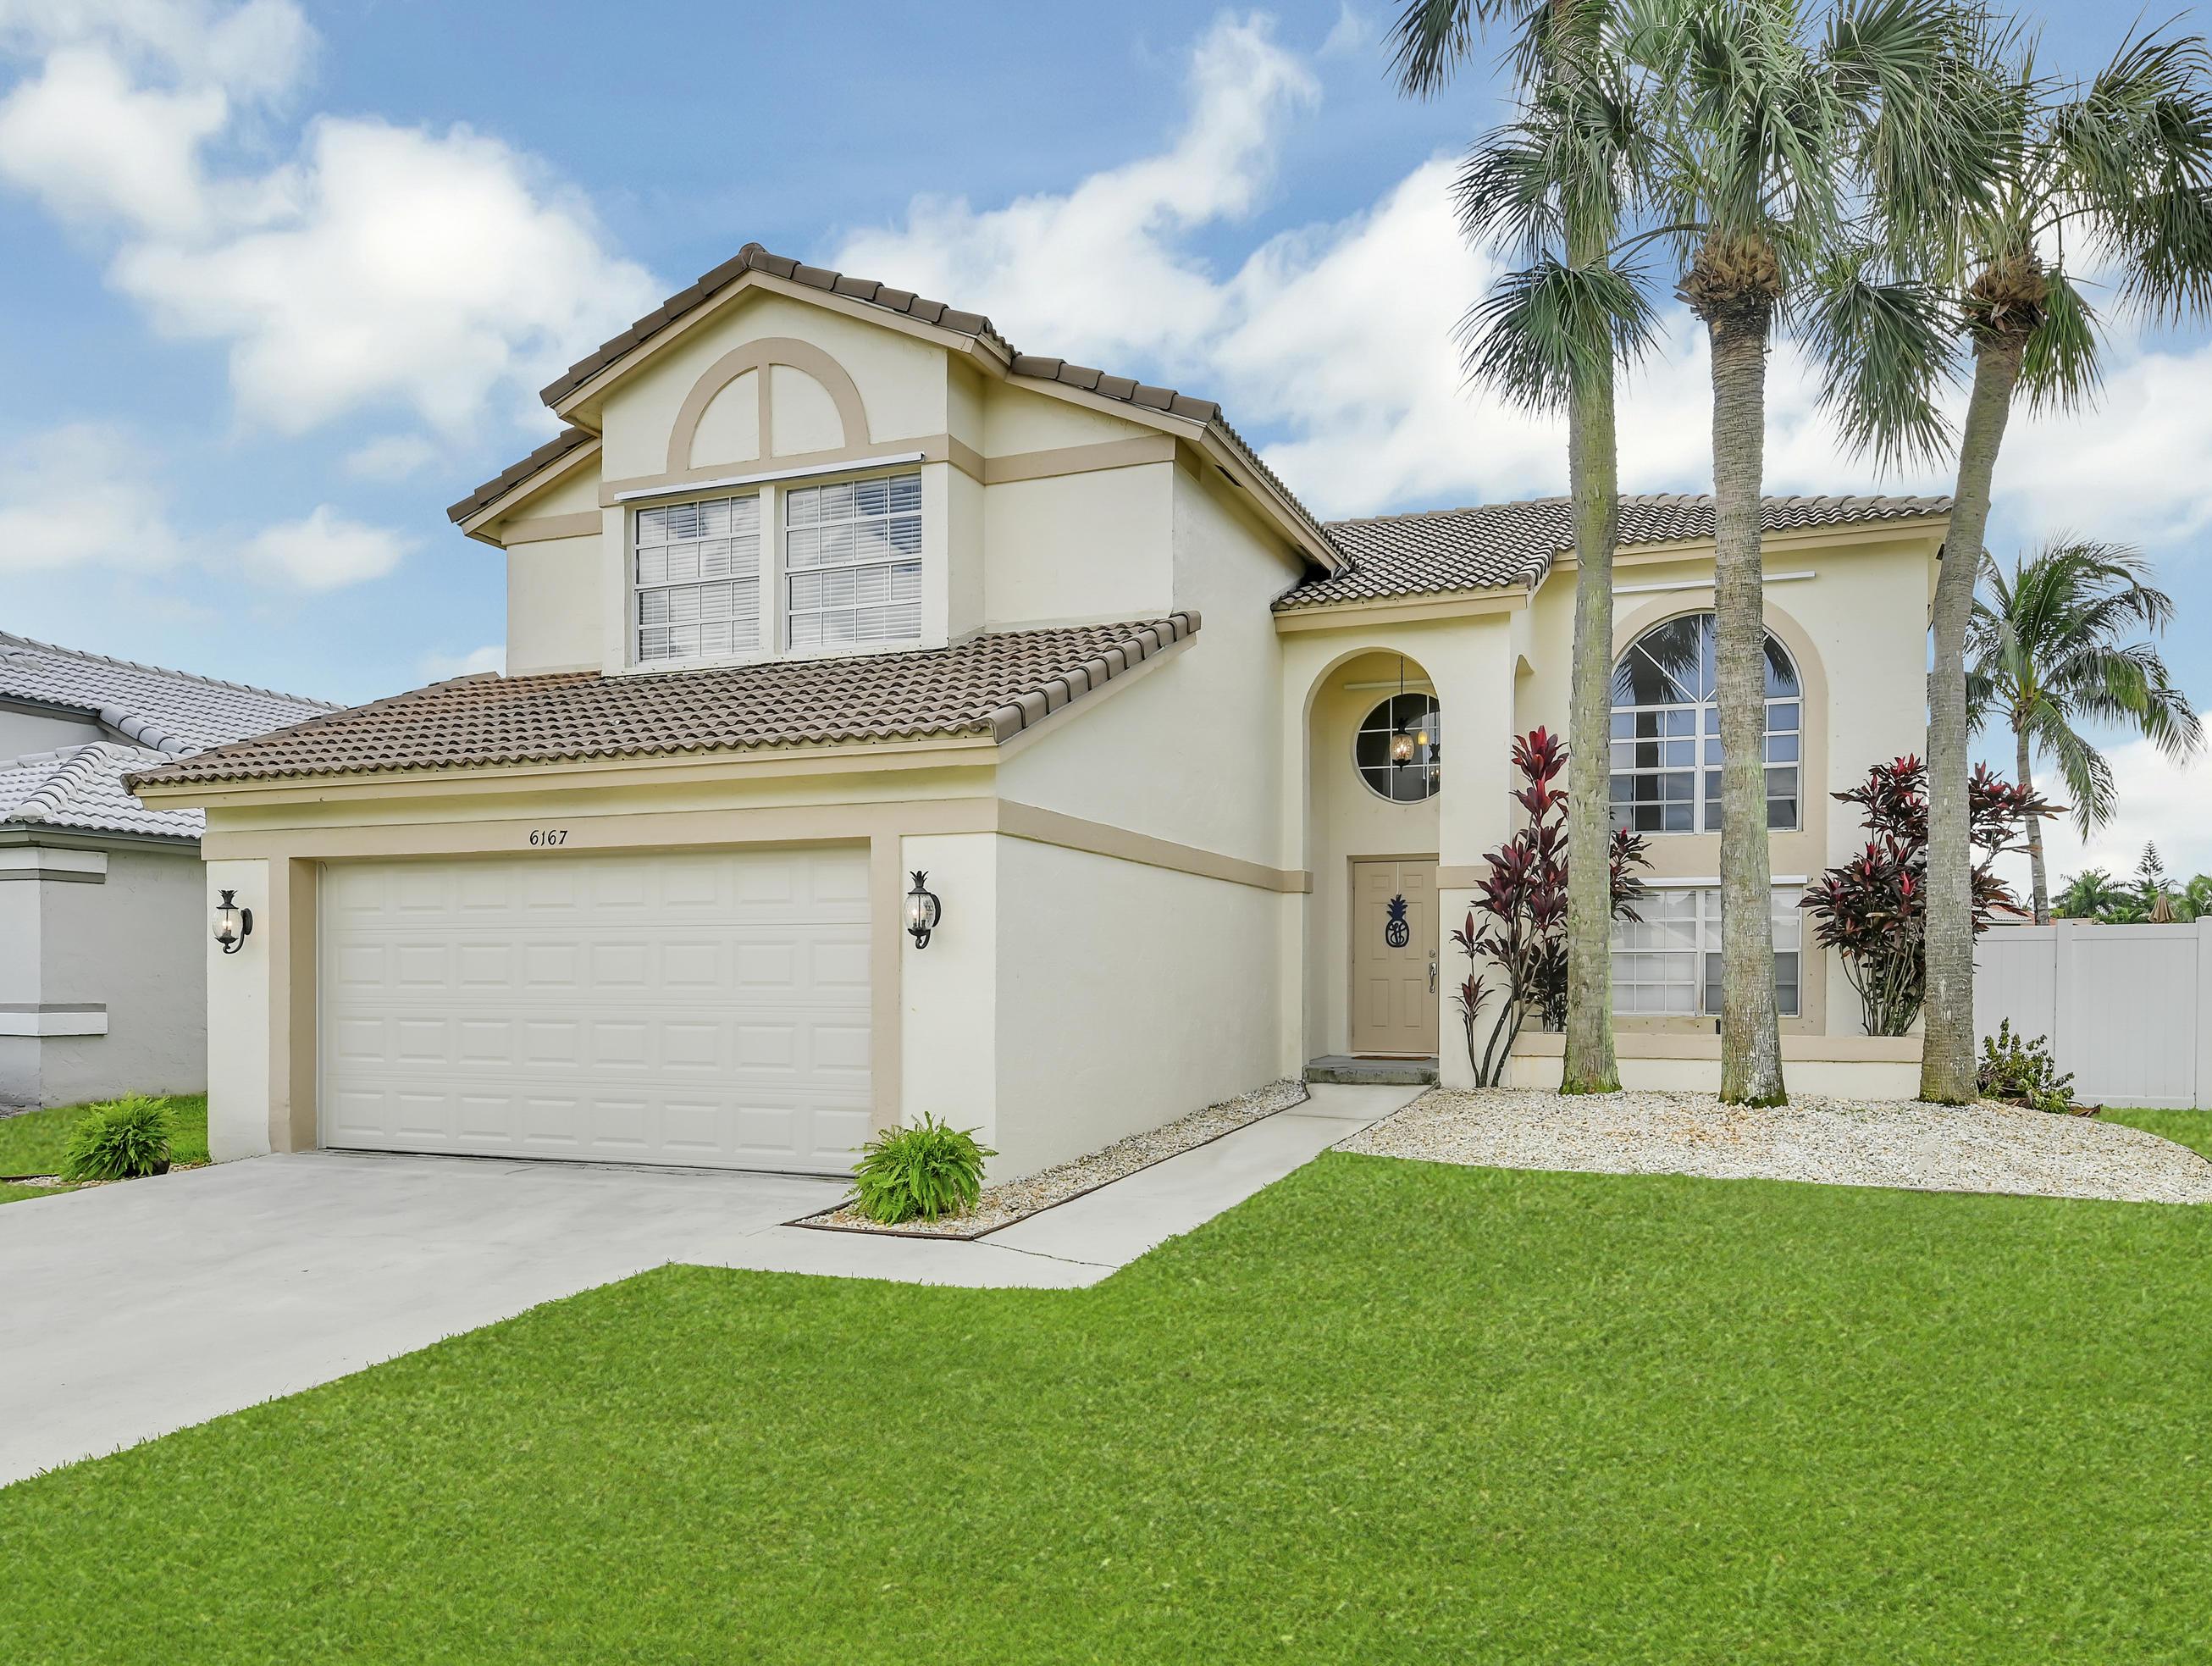 Details for 6167 Windlass Circle, Boynton Beach, FL 33437